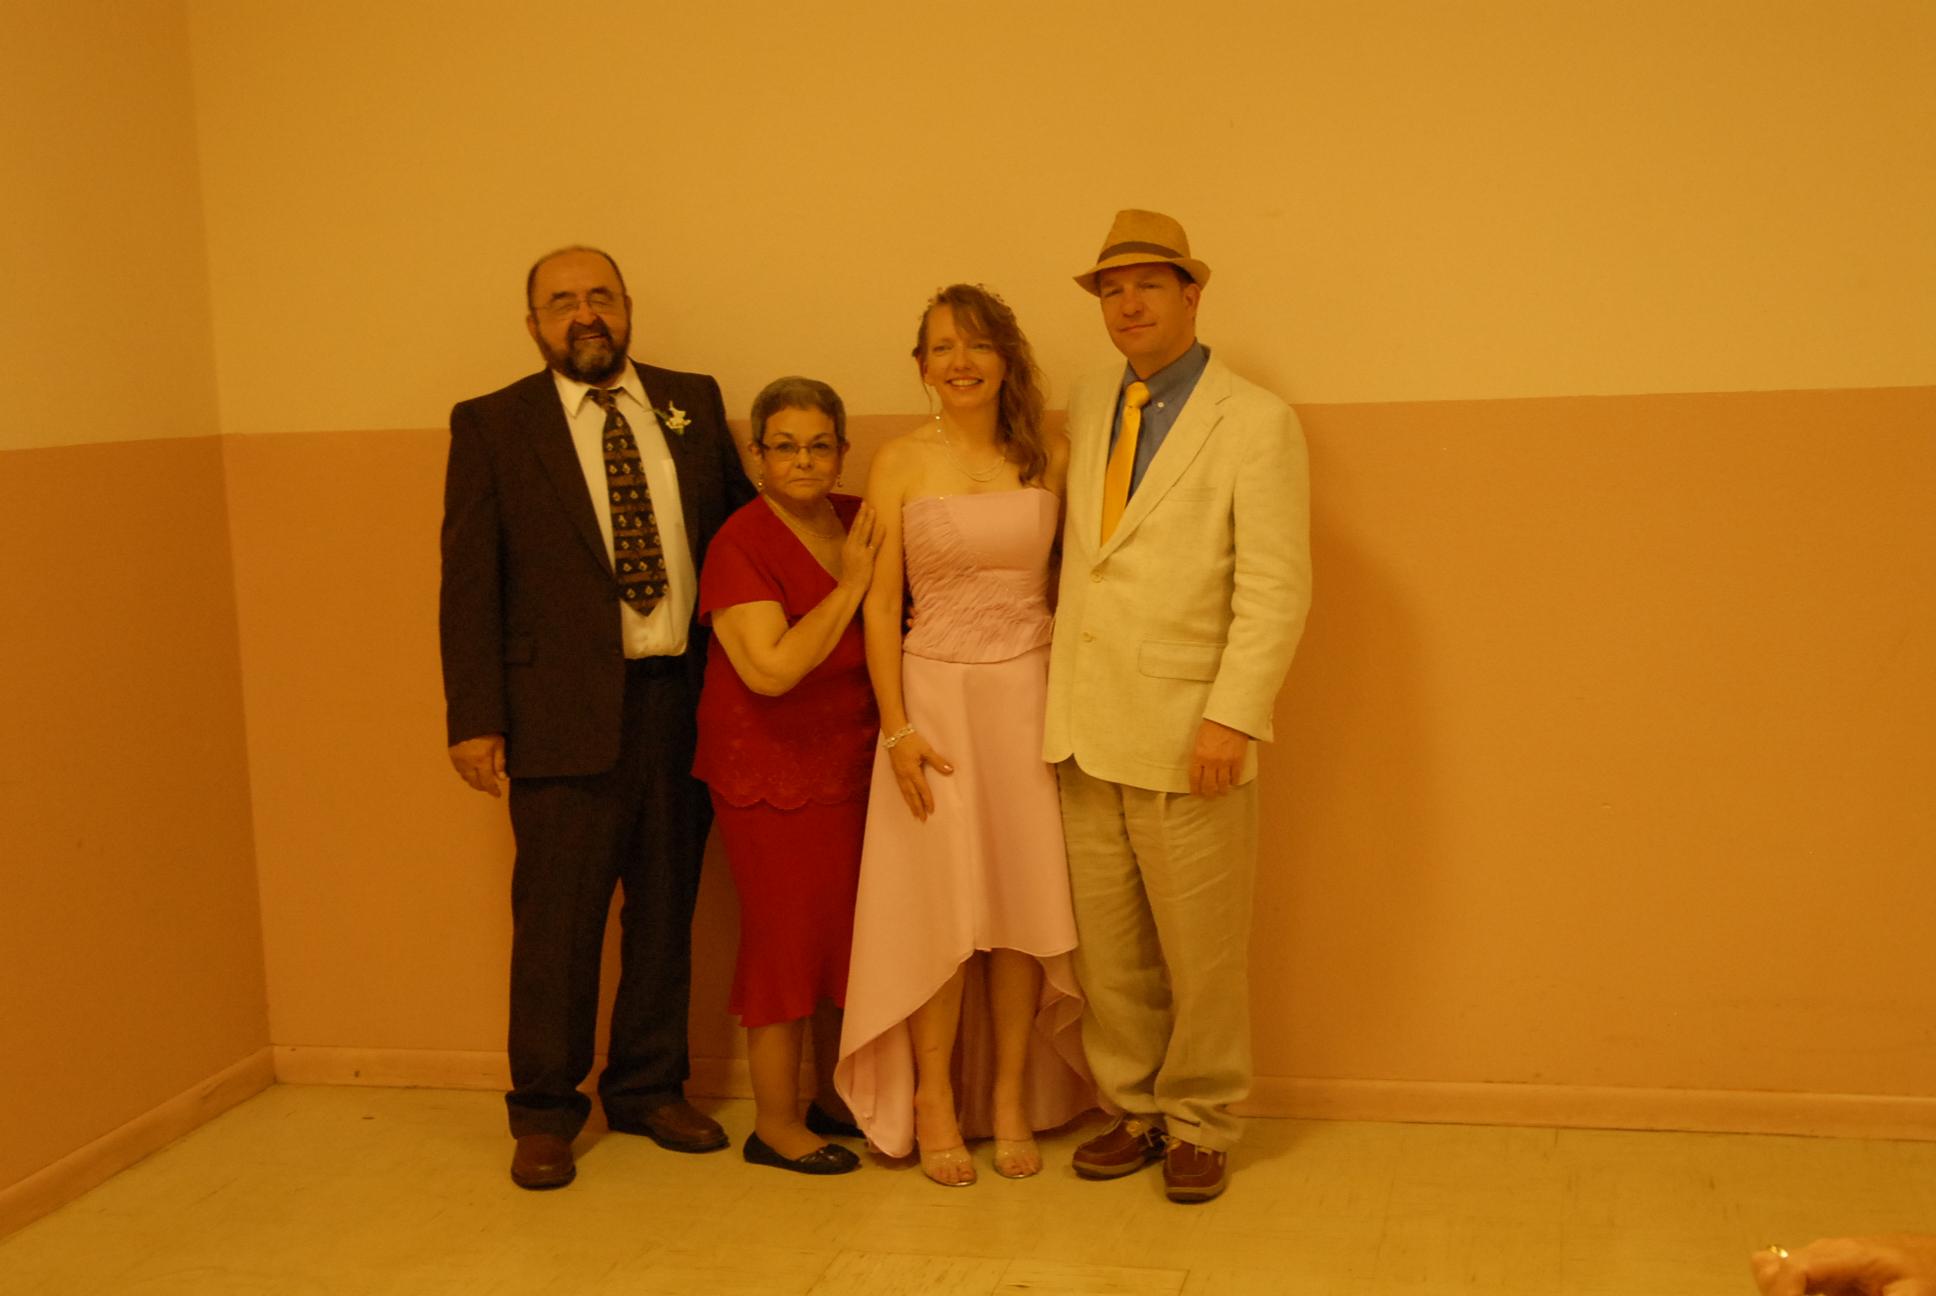 emily-and-travis-4-1-2013-april-fools-wedding-2-470